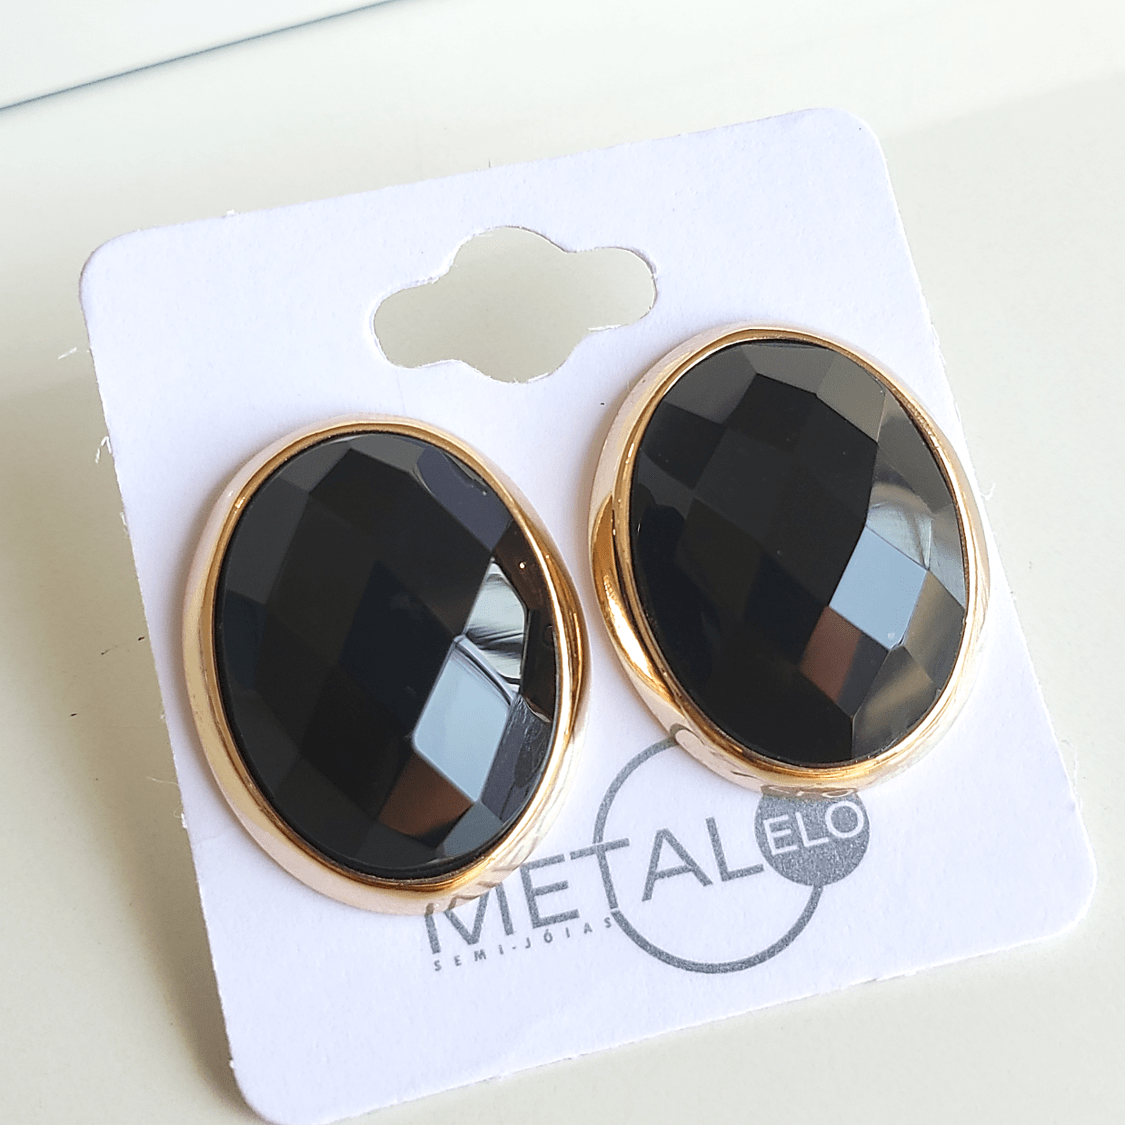 Brinco botão oval de cristal preto ônix 23x19mm